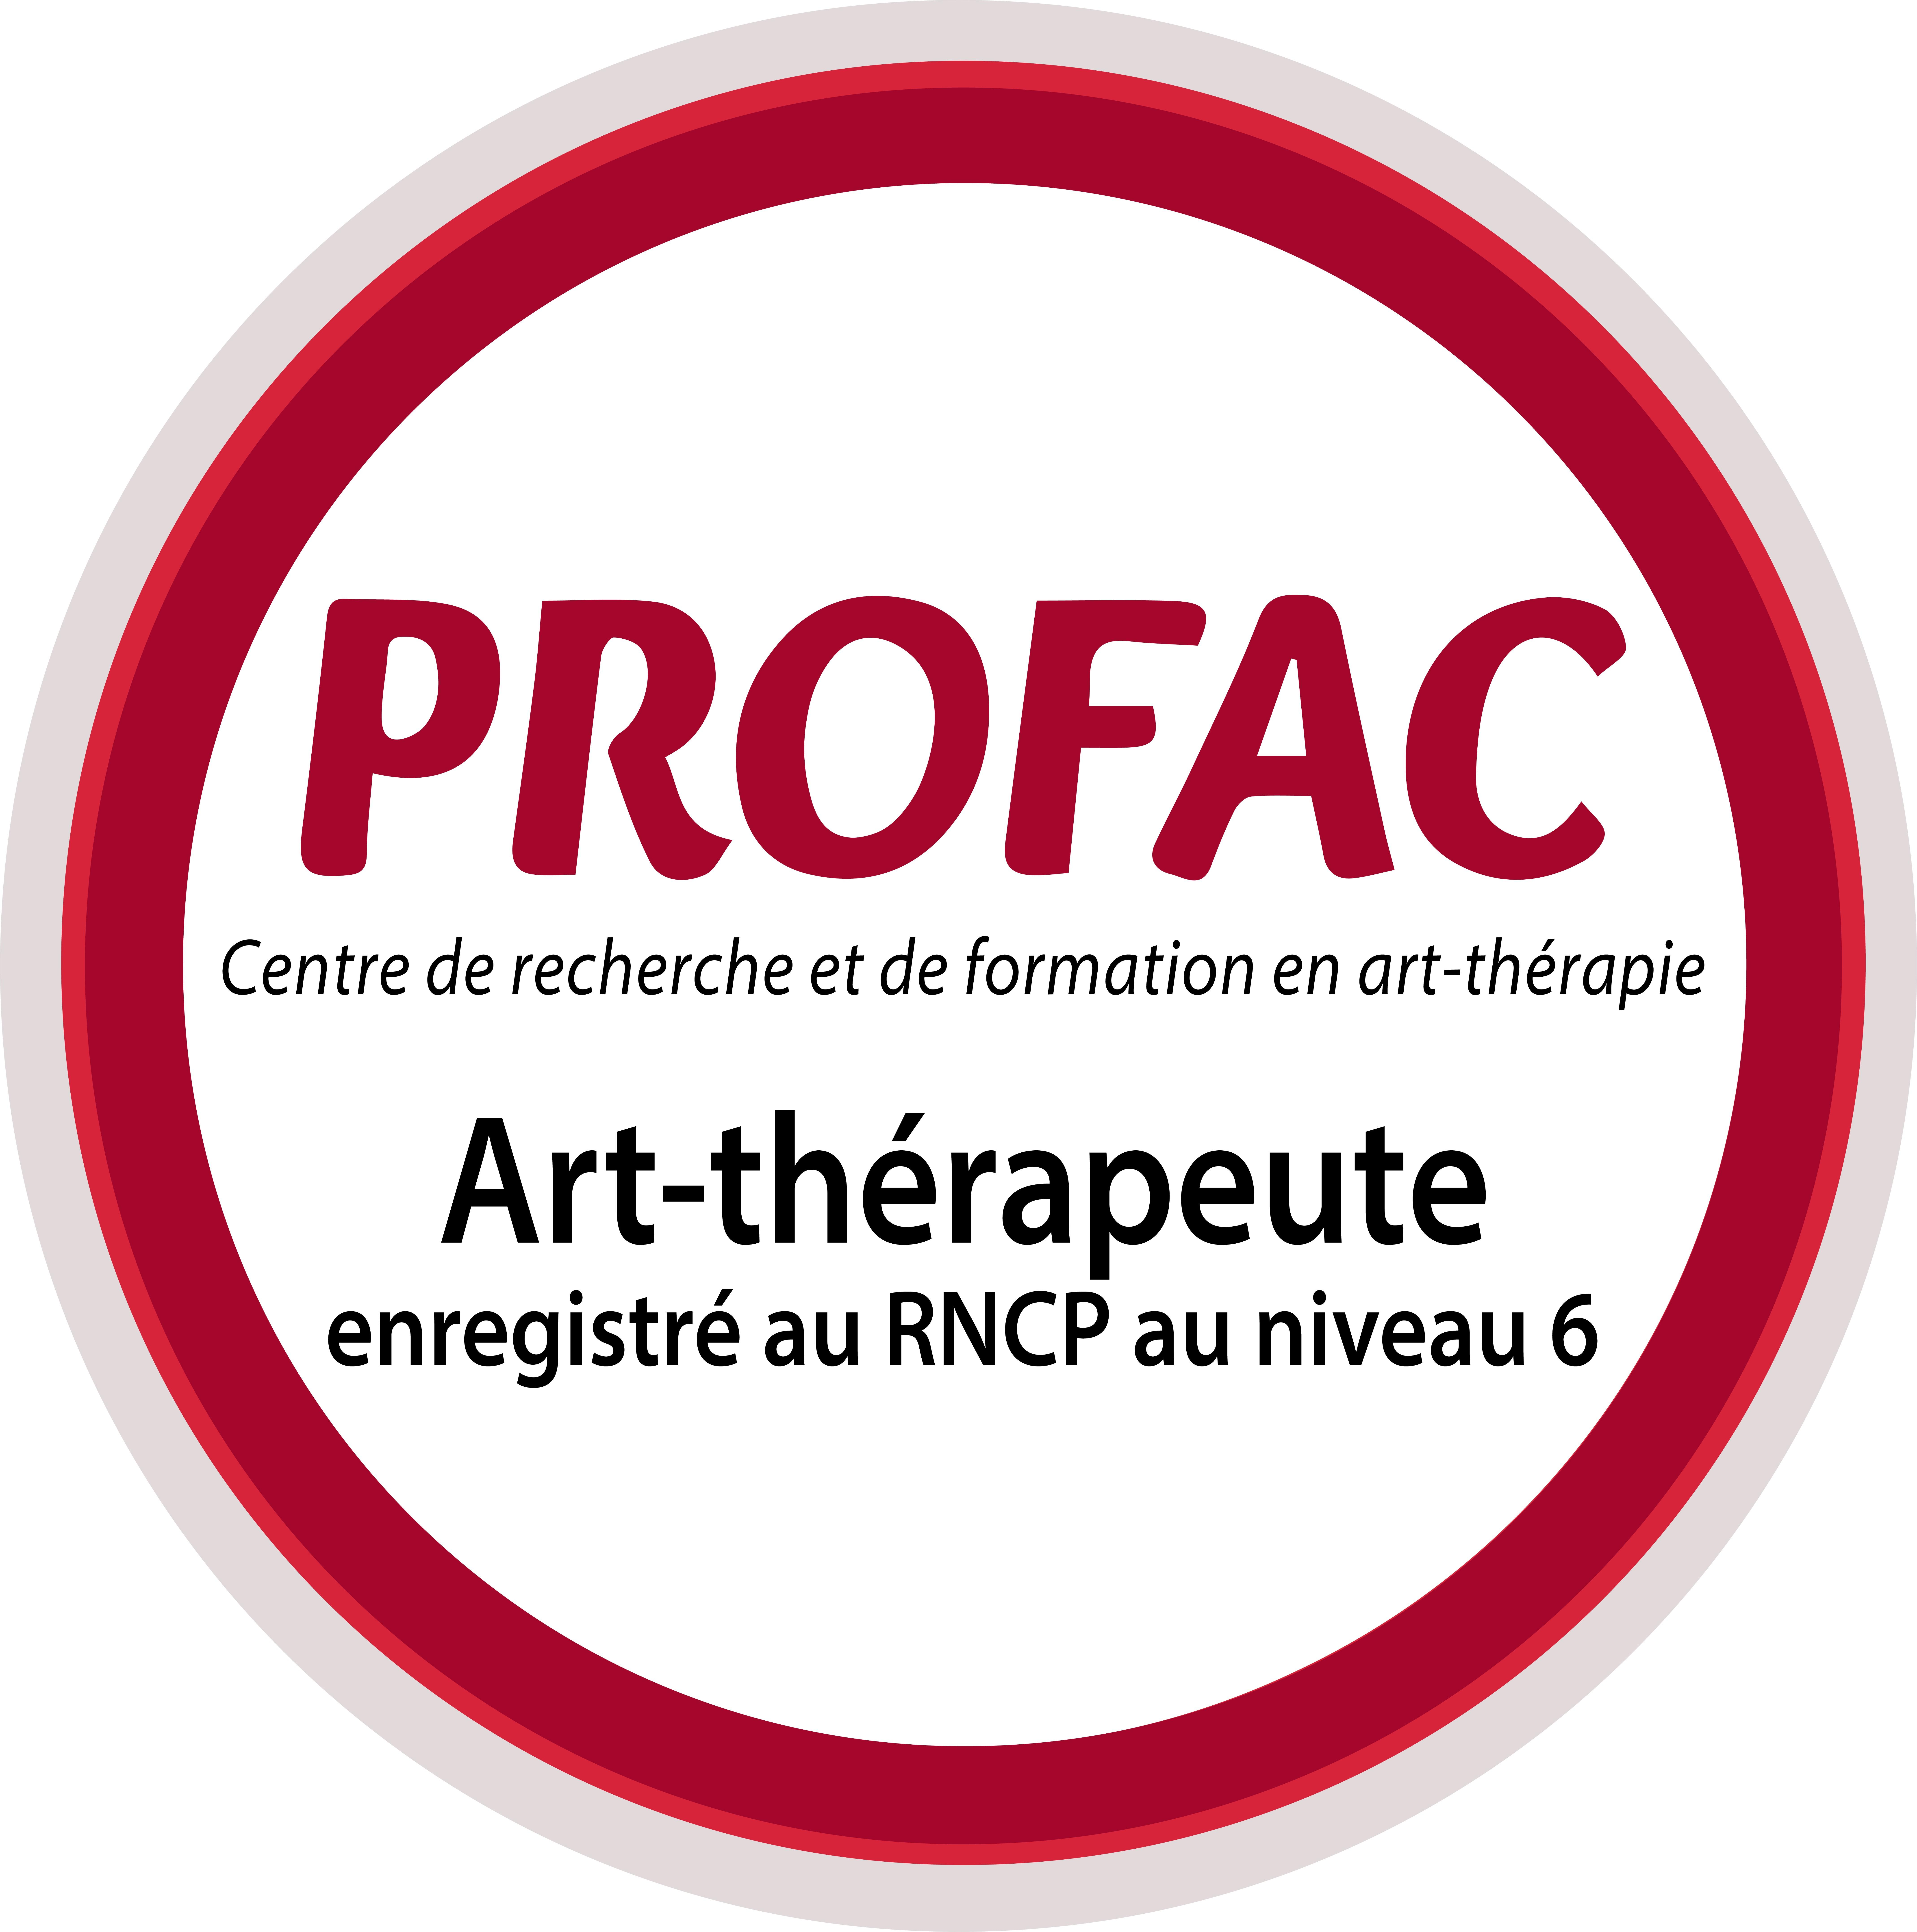 https://www.artherapie.com/docs/logopro.jpg